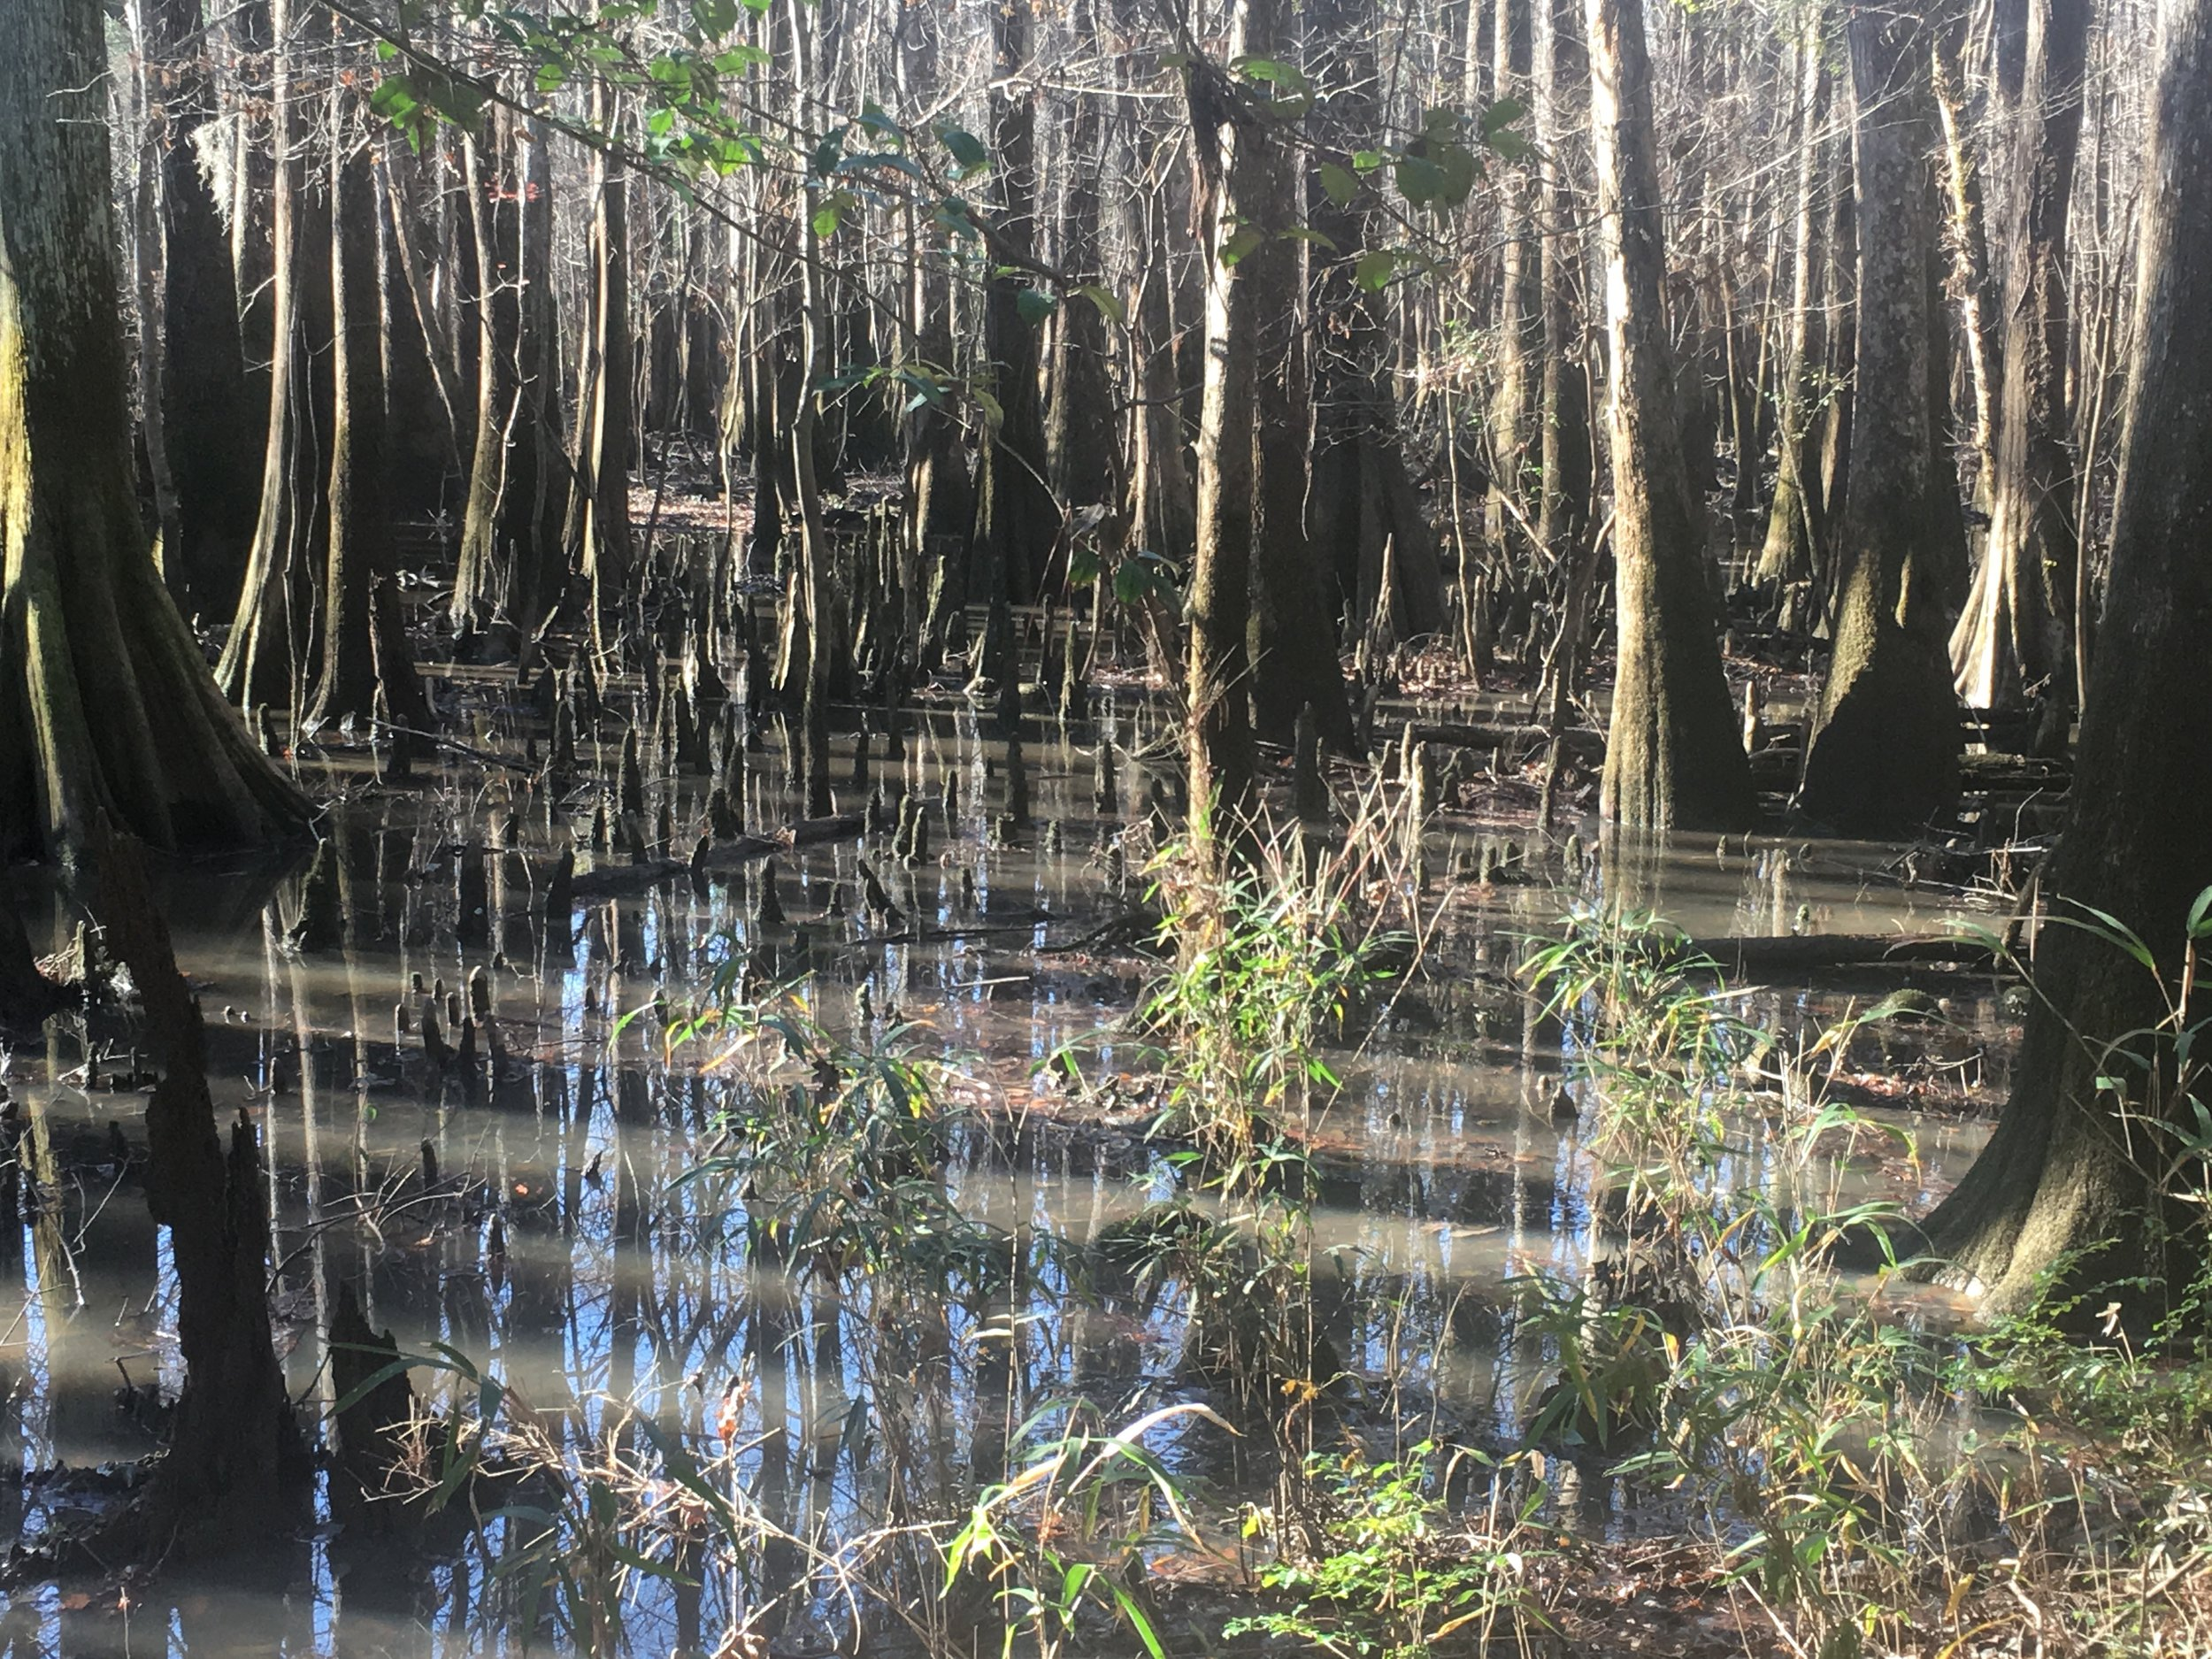 Floodplain, not swamp.